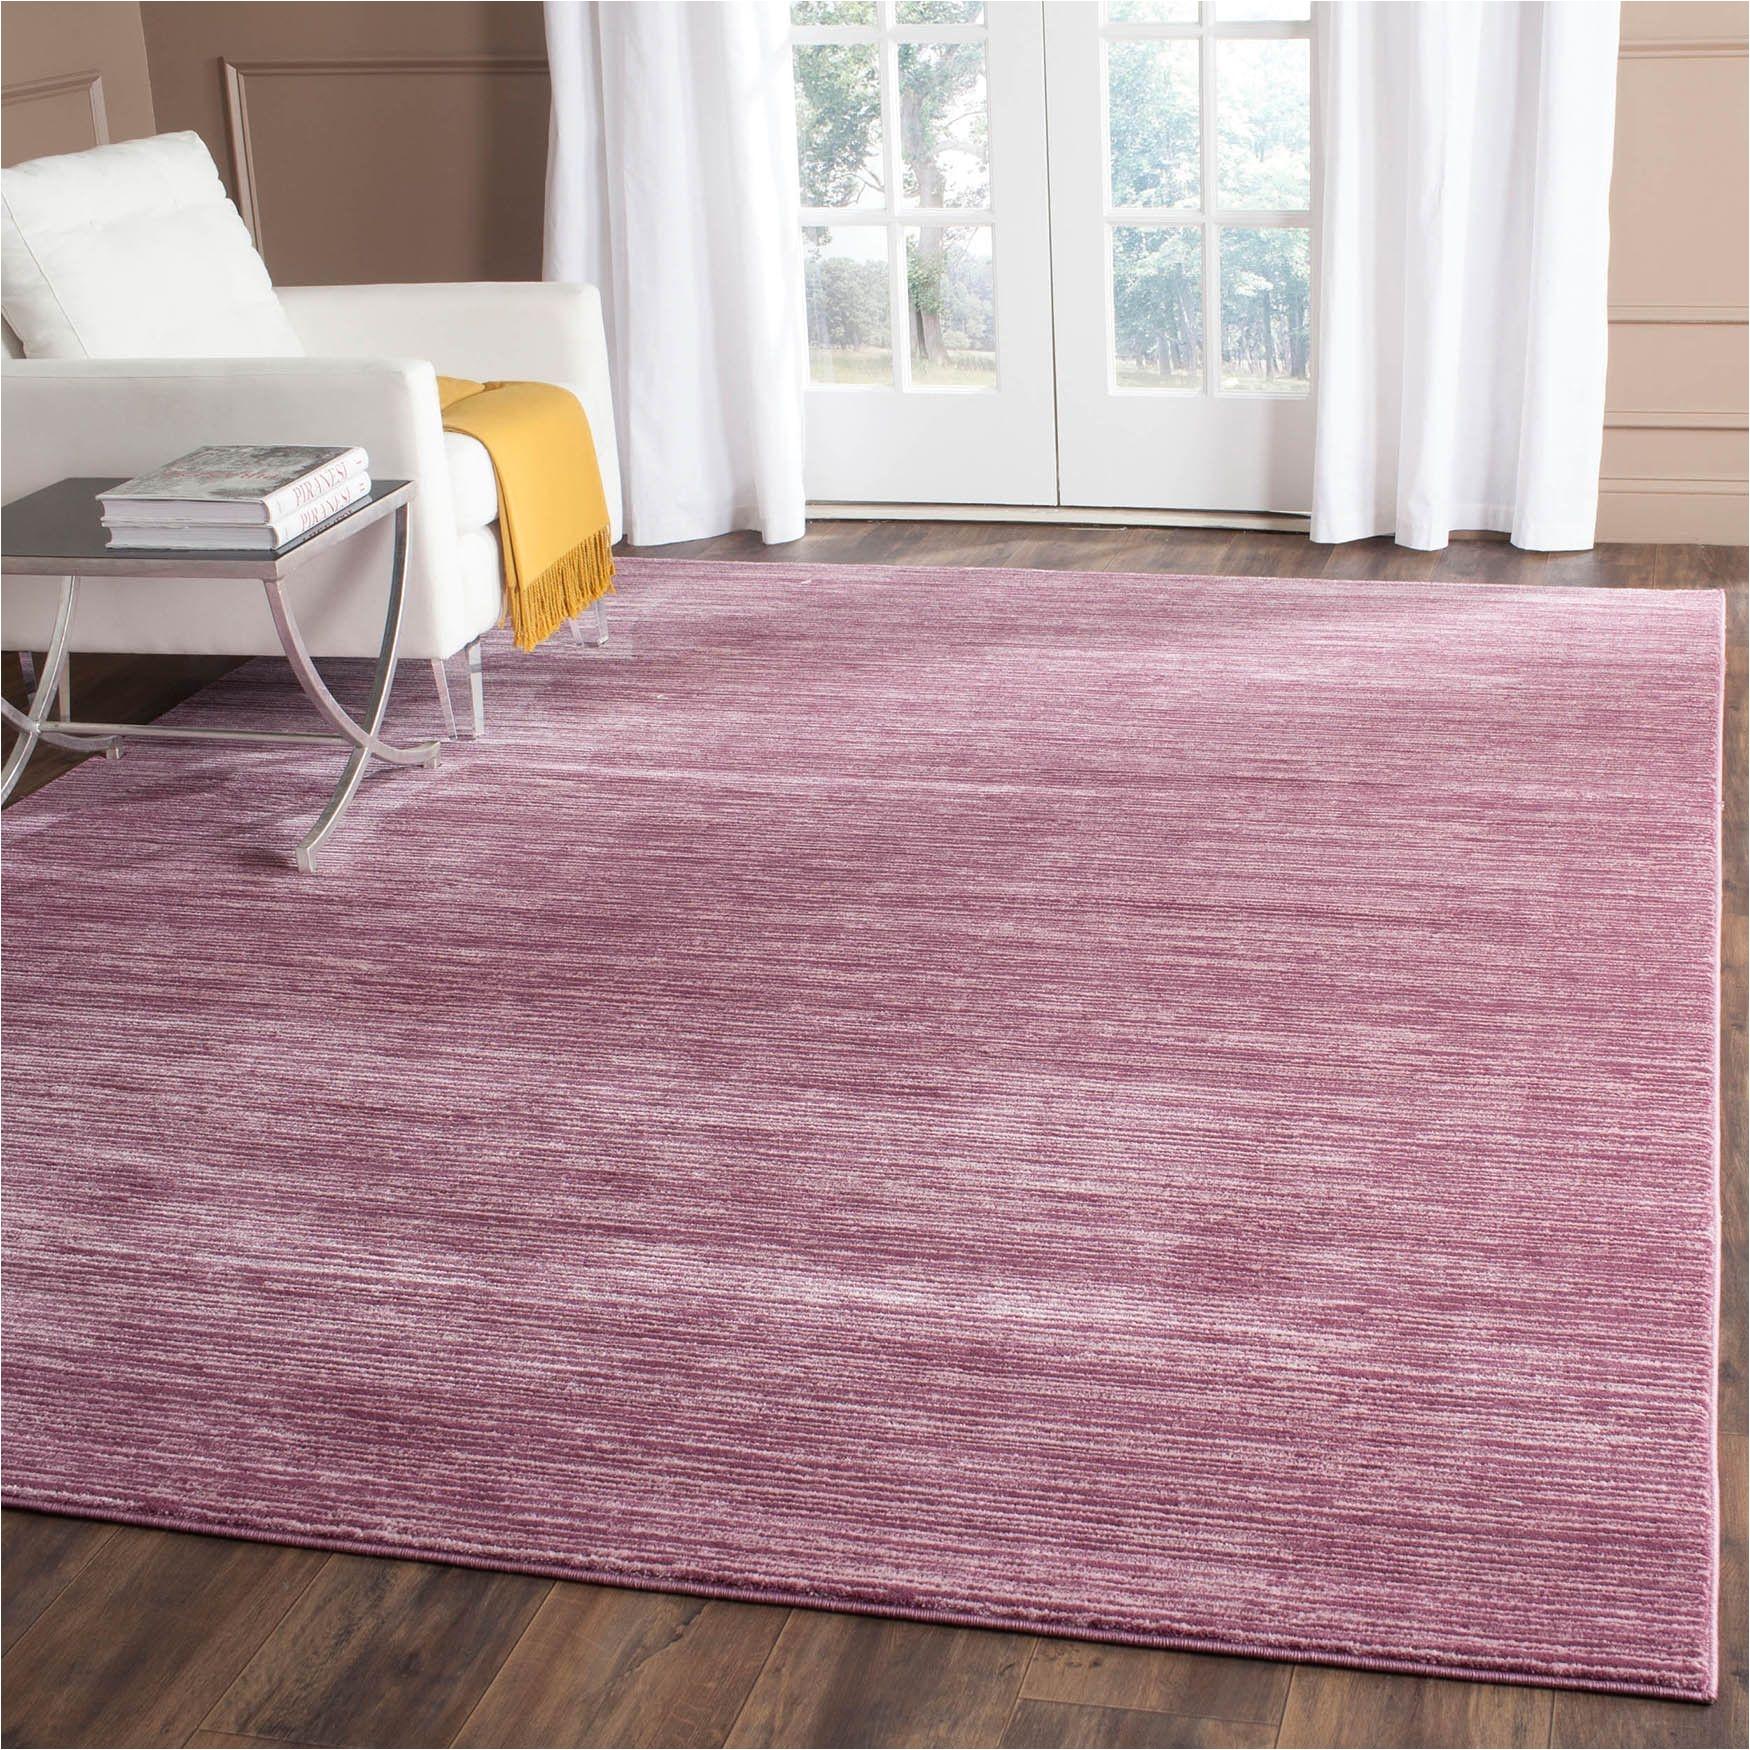 Blush Pink area Rug 8×10 Safavieh Vision Contemporary tonal Purple Pink area Rug 8 X 10